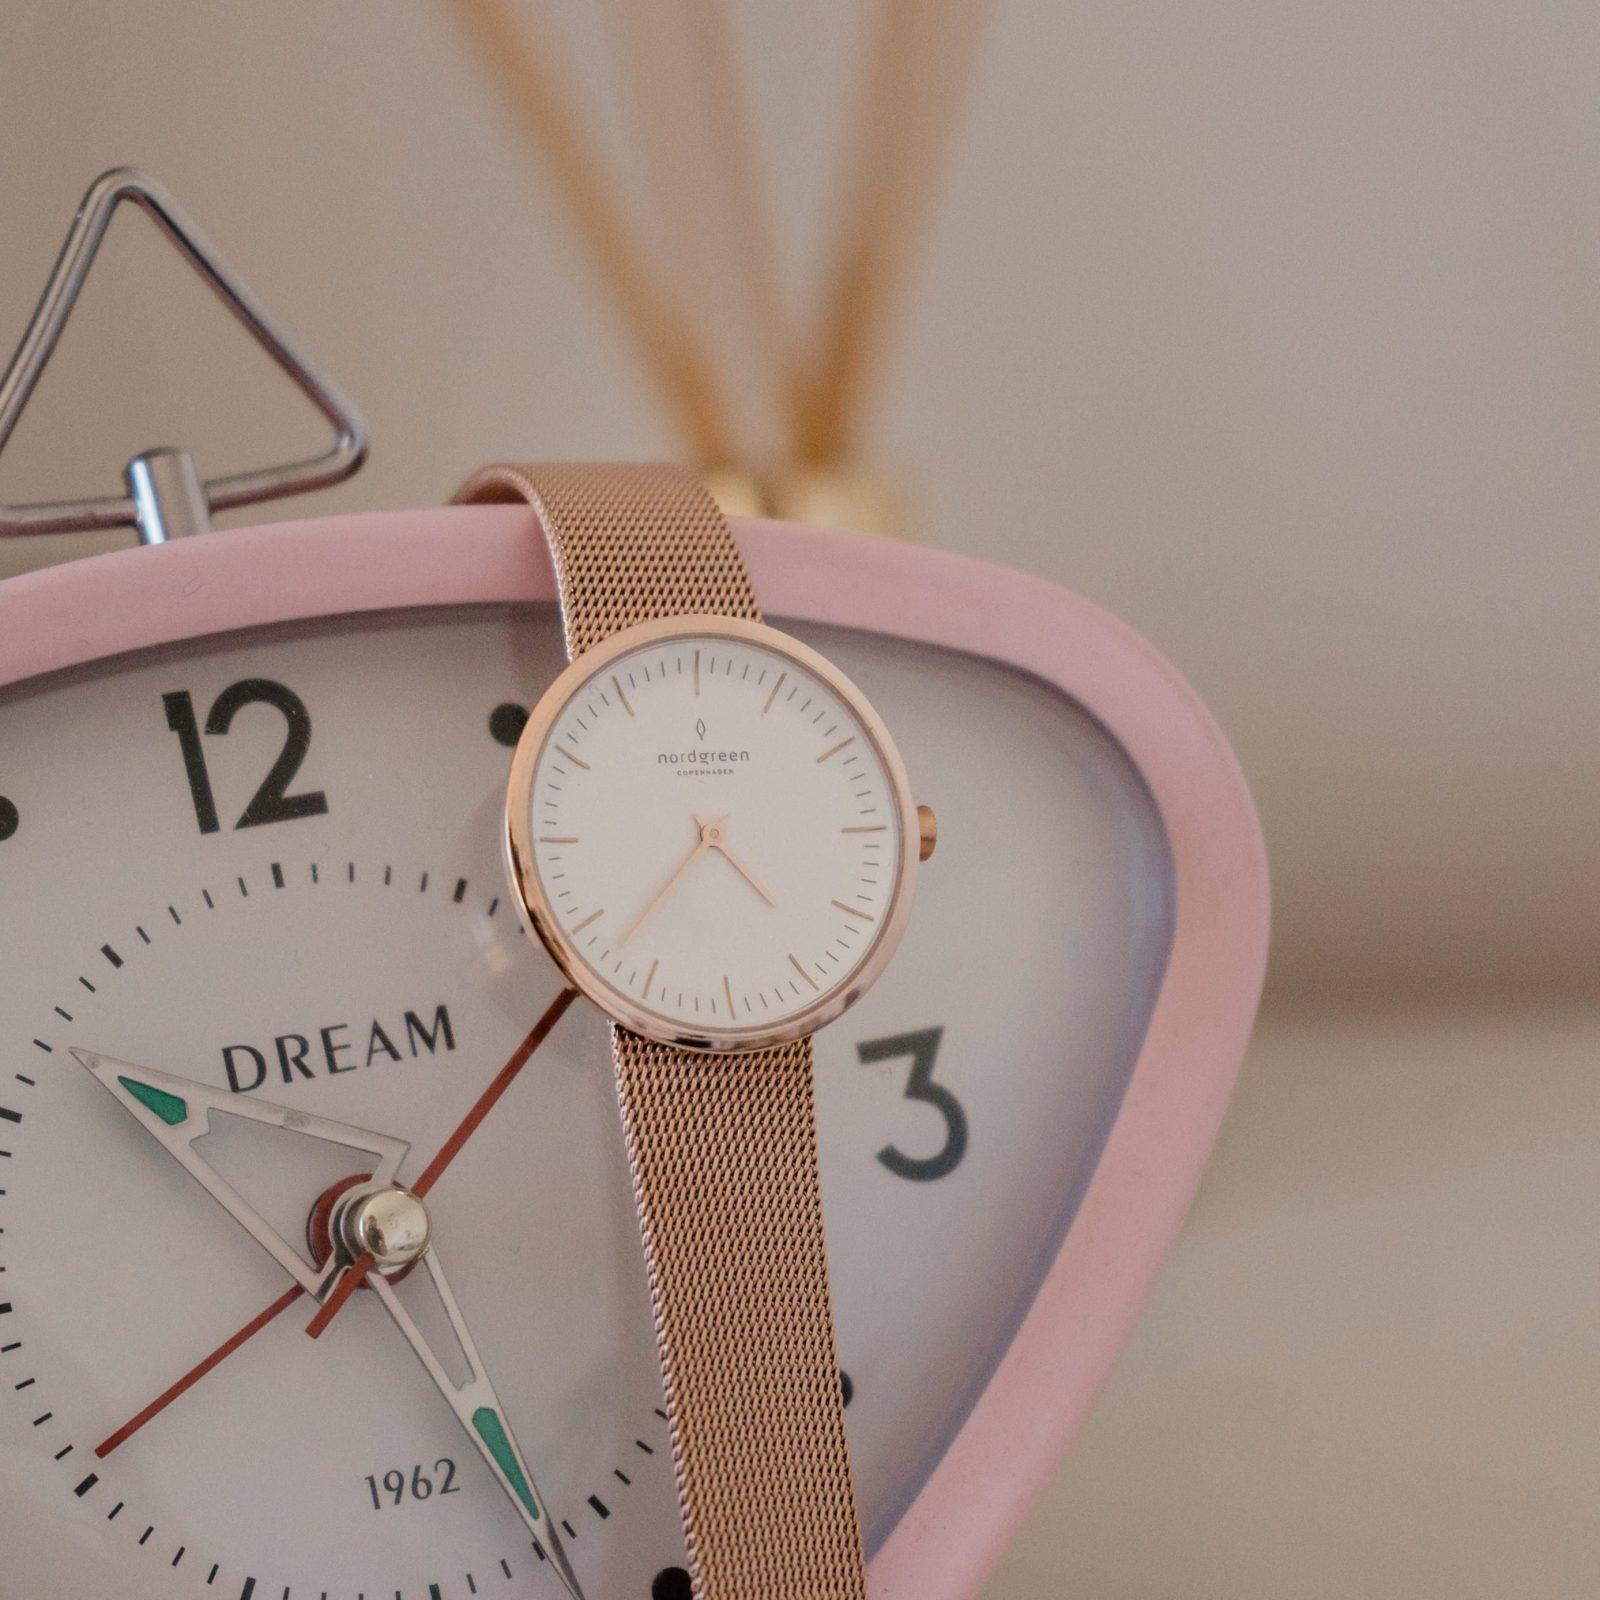 rose gold watch face nordgreen